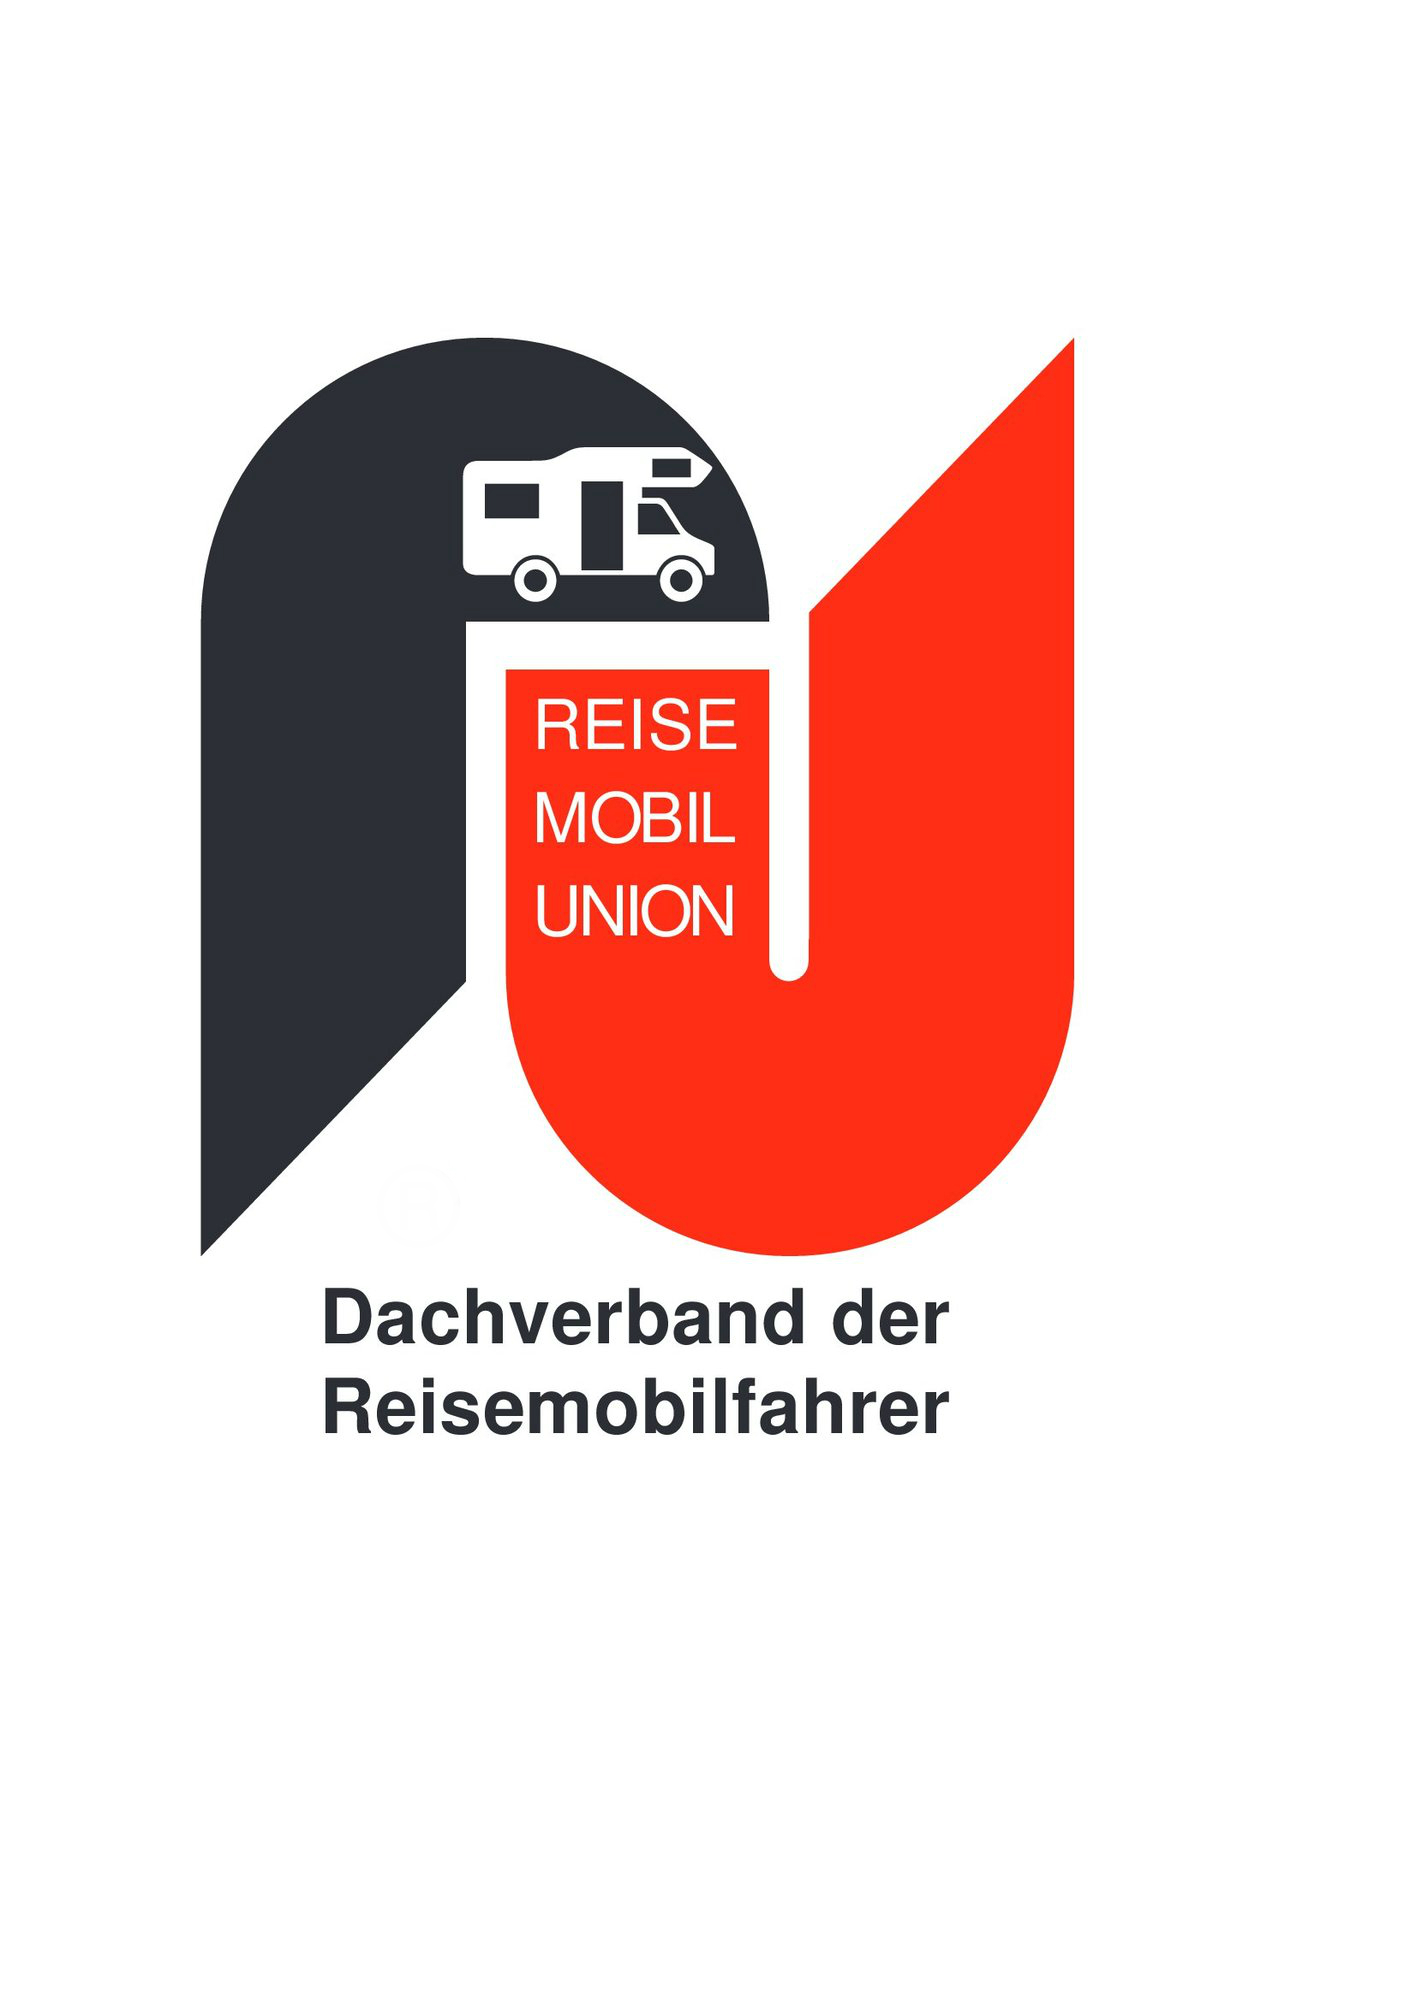 REISEMOBIL UNION Dachverband der Reisemobilfahrer